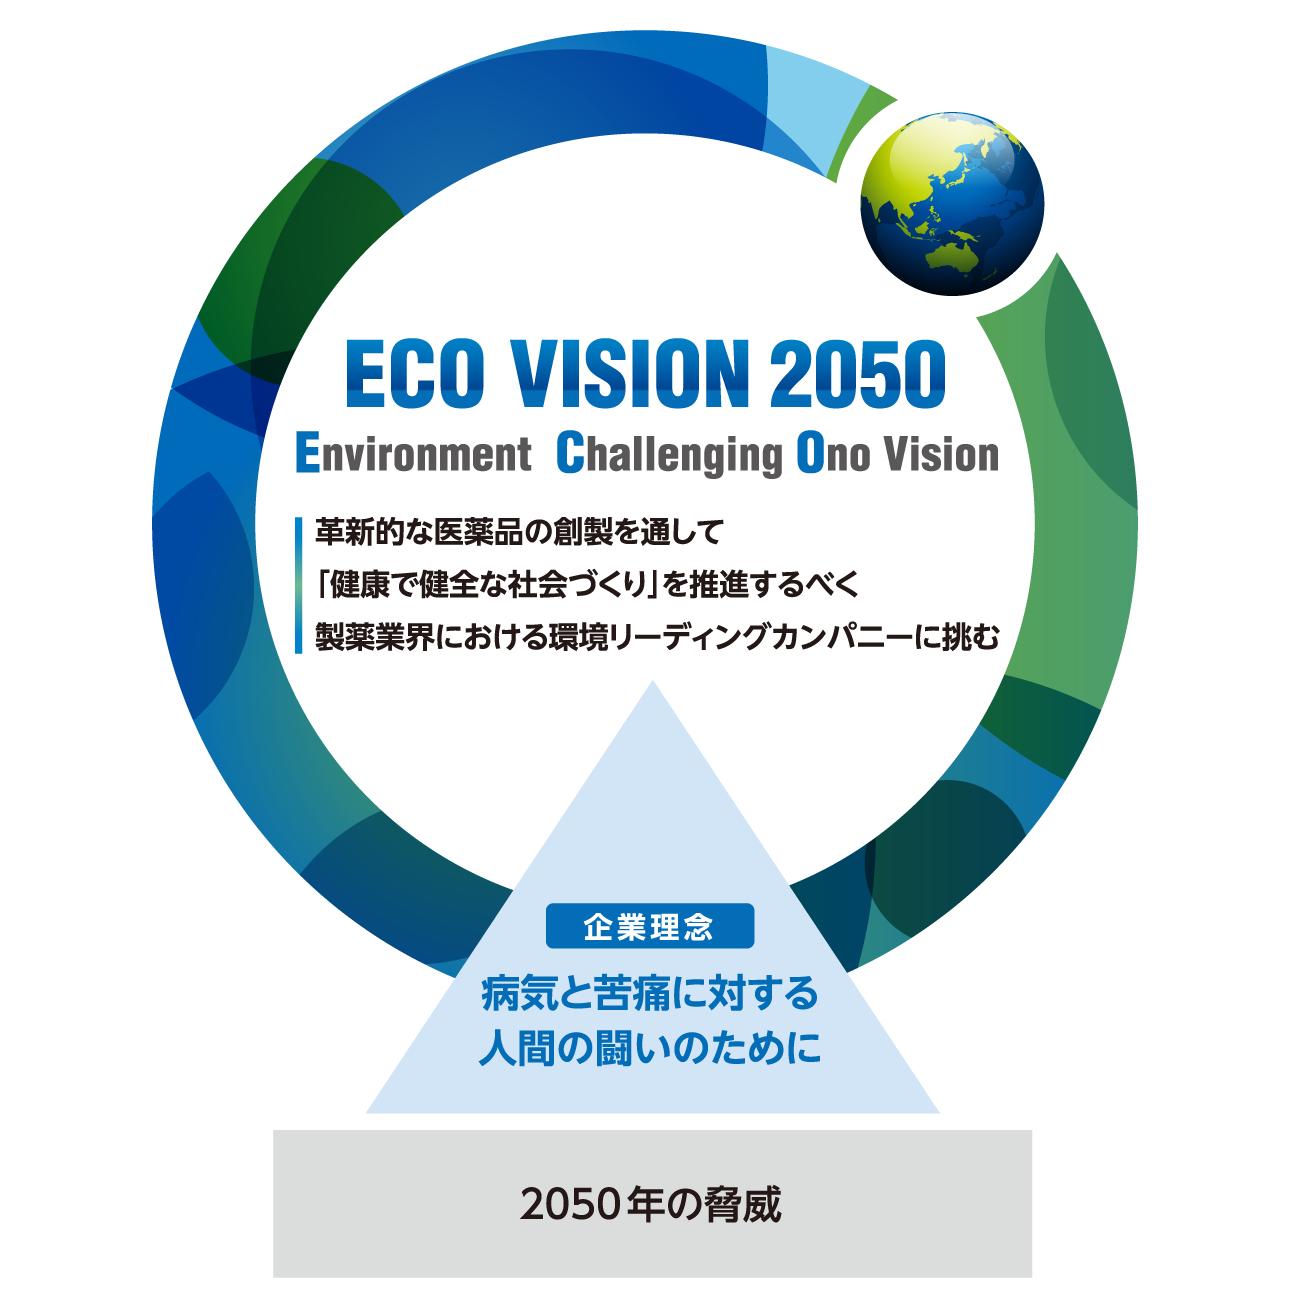 ECO VISION 2050